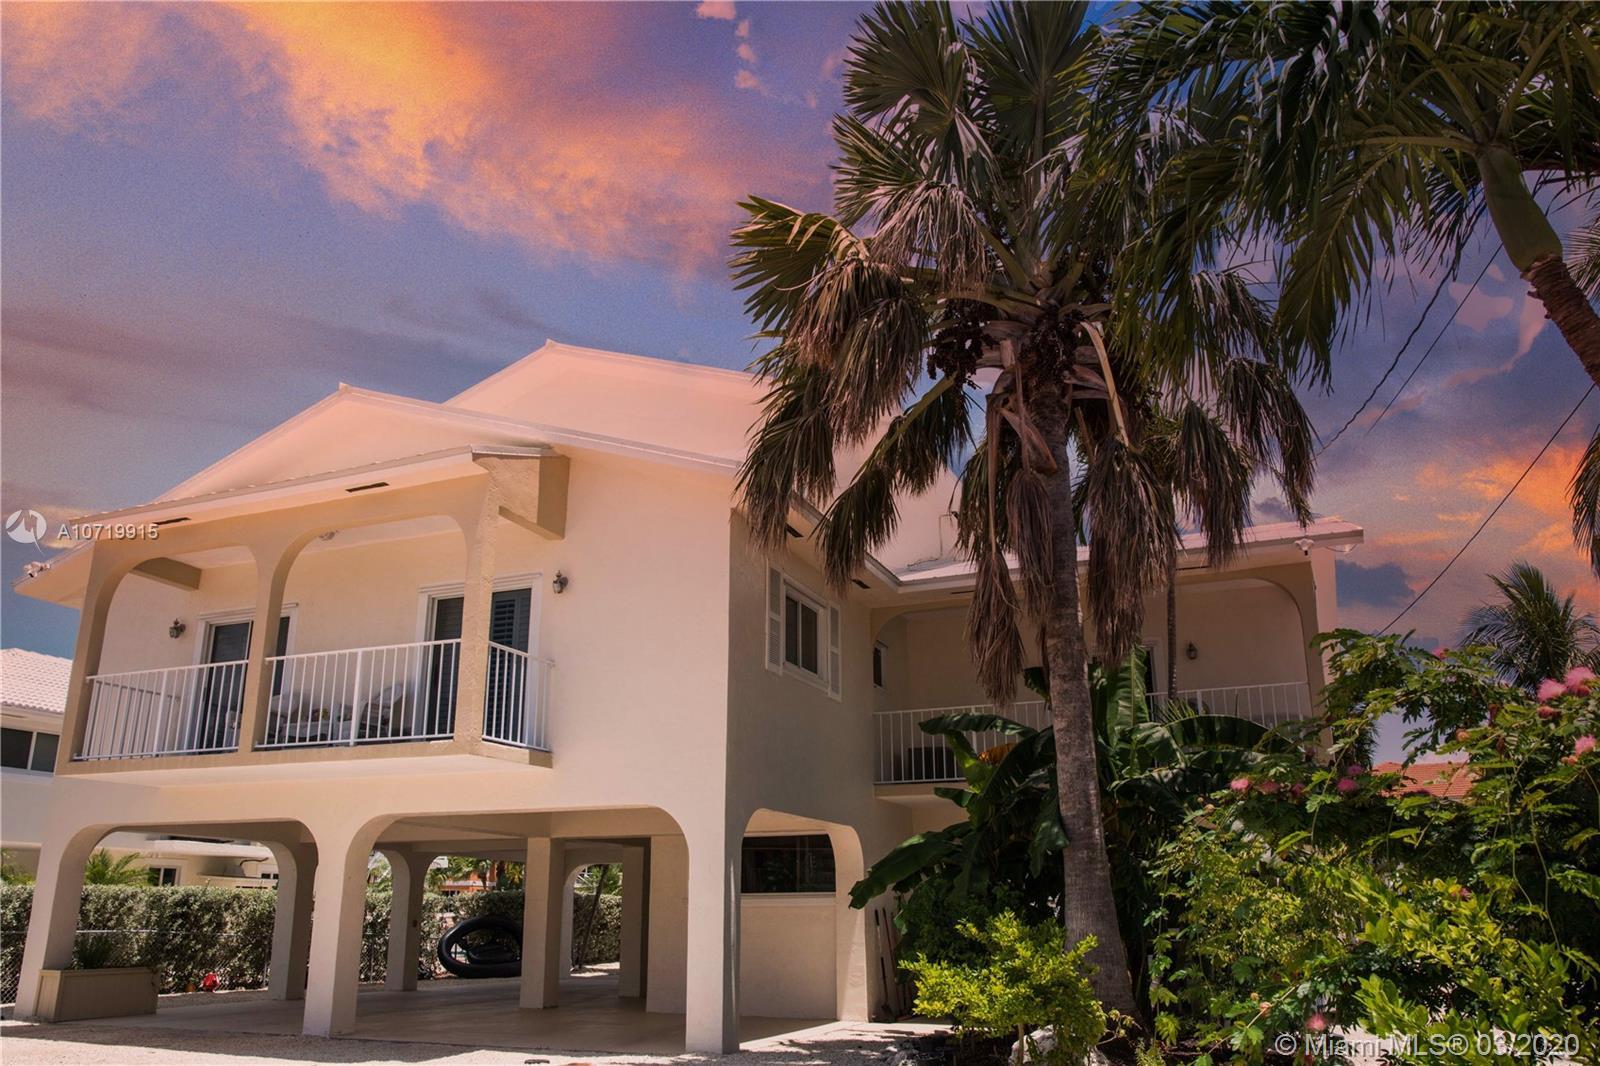 479 Bahia Ave, Other City - Keys/Islands/Caribb, FL 33037 - Other City - Keys/Islands/Caribb, FL real estate listing